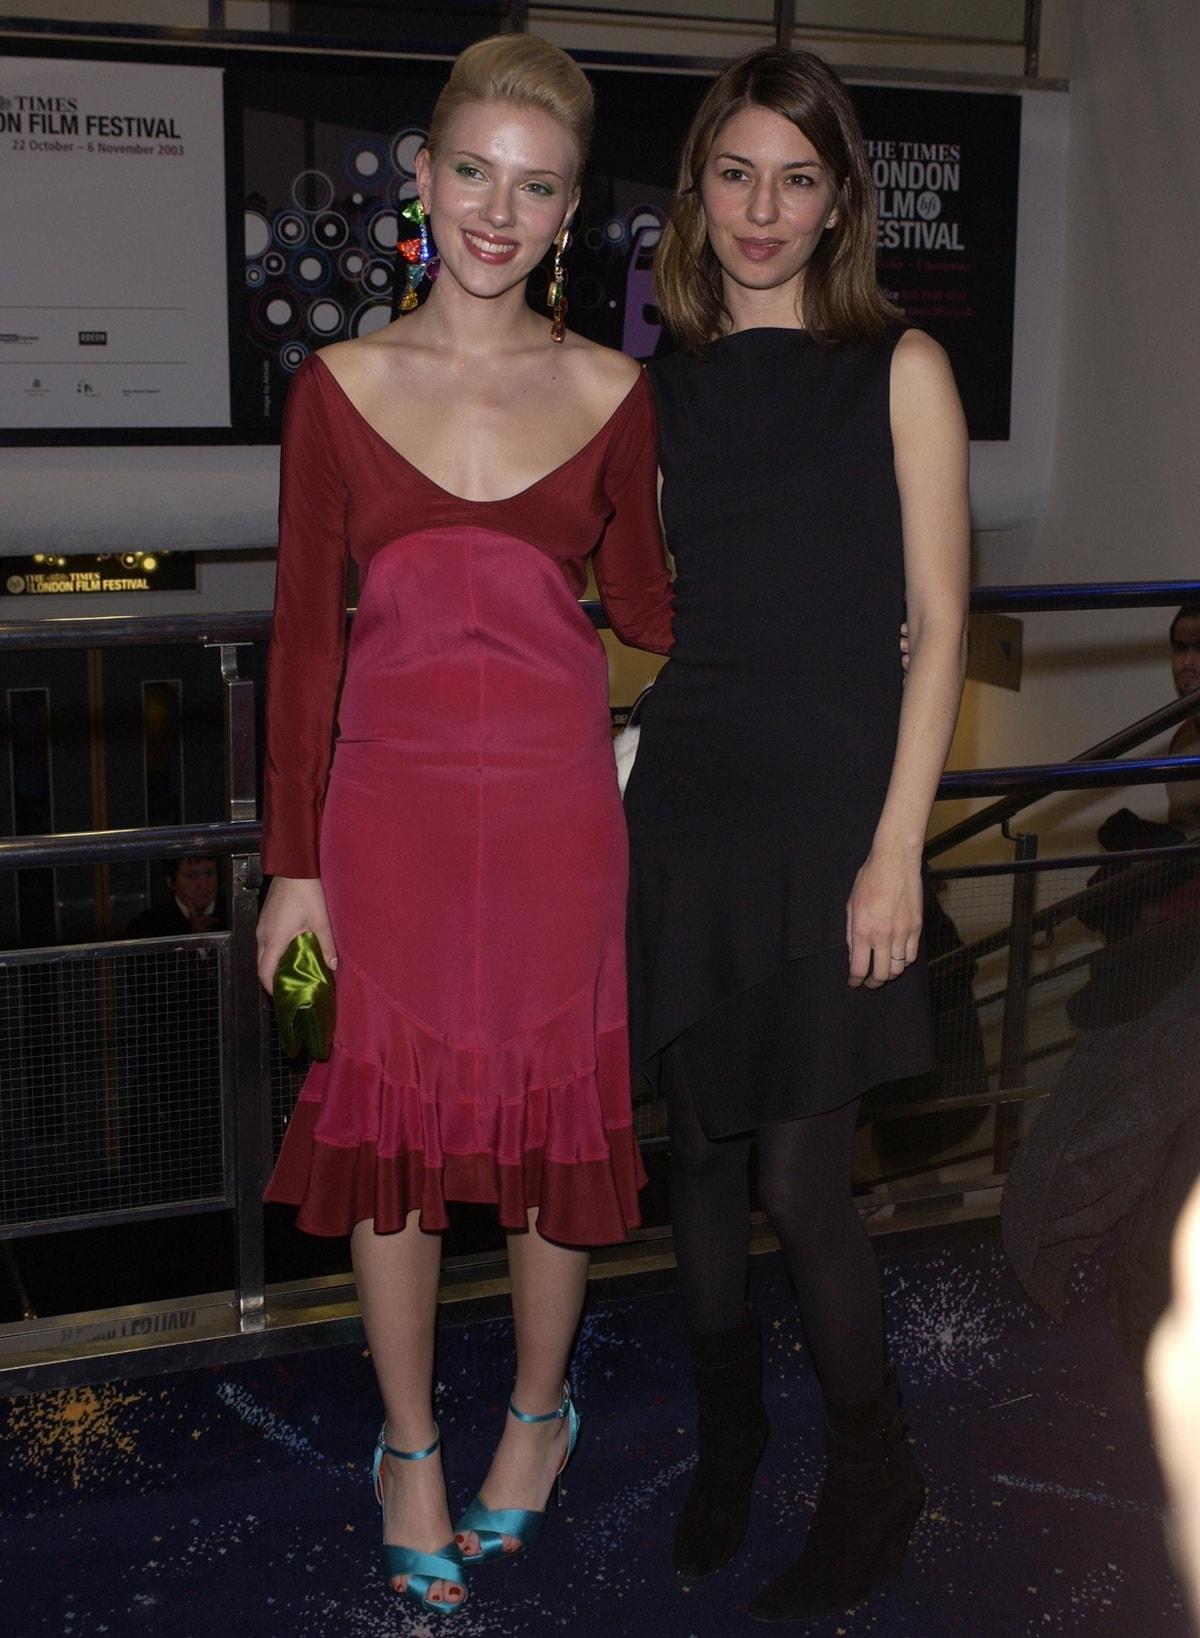 Scarlett Johansson and Sofia Coppola at the premiere of Lost In Translation